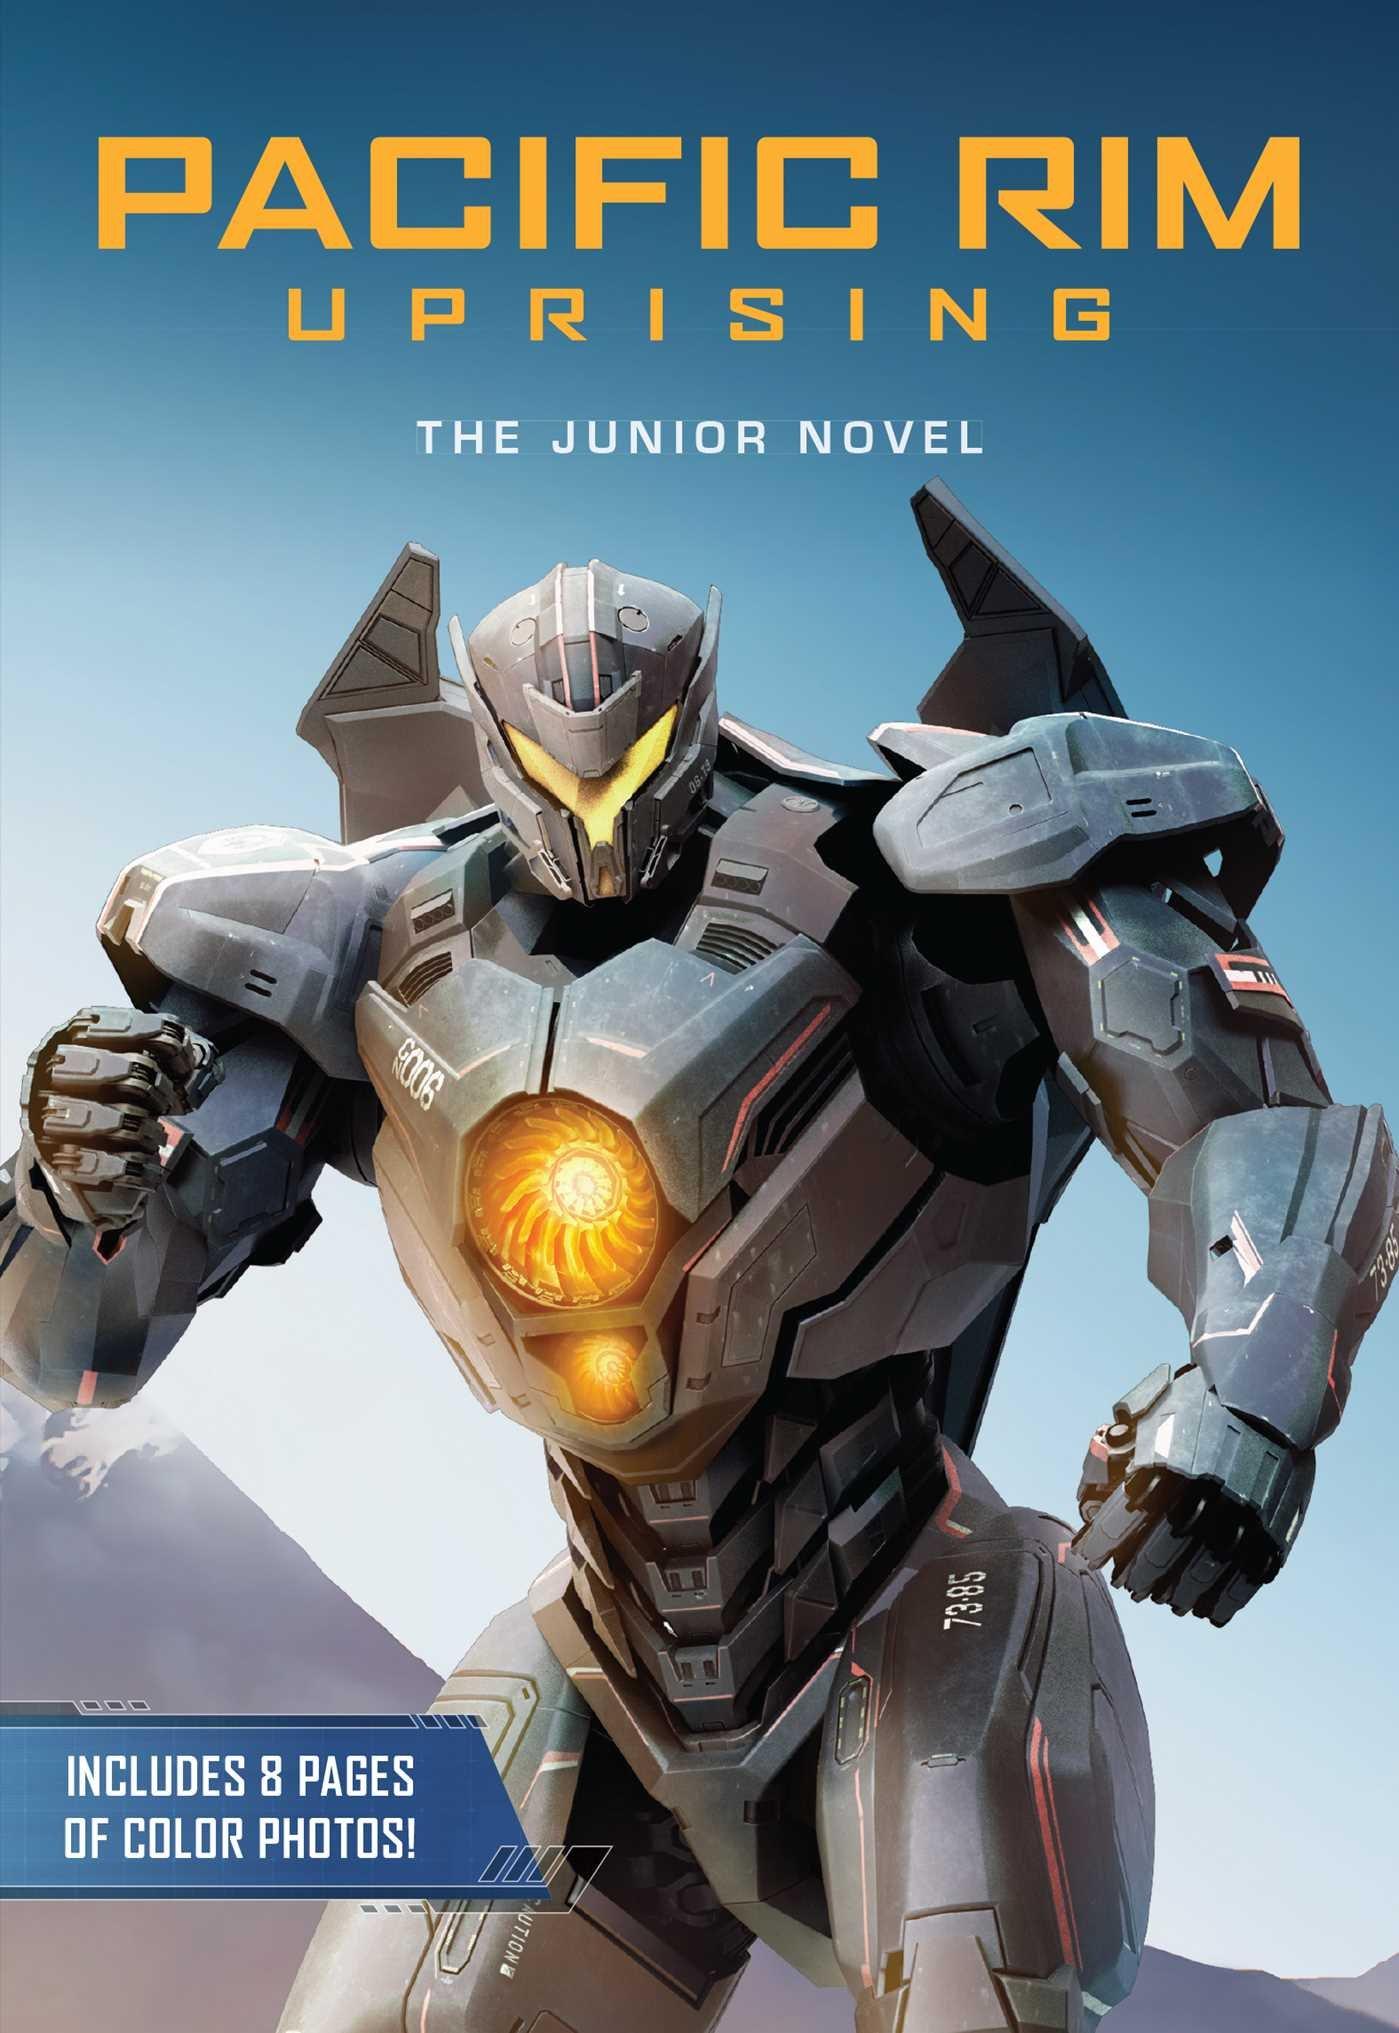 Pacific Rim Uprising: The Junior Novel | Pacific Rim Wiki ... Pacific Rim